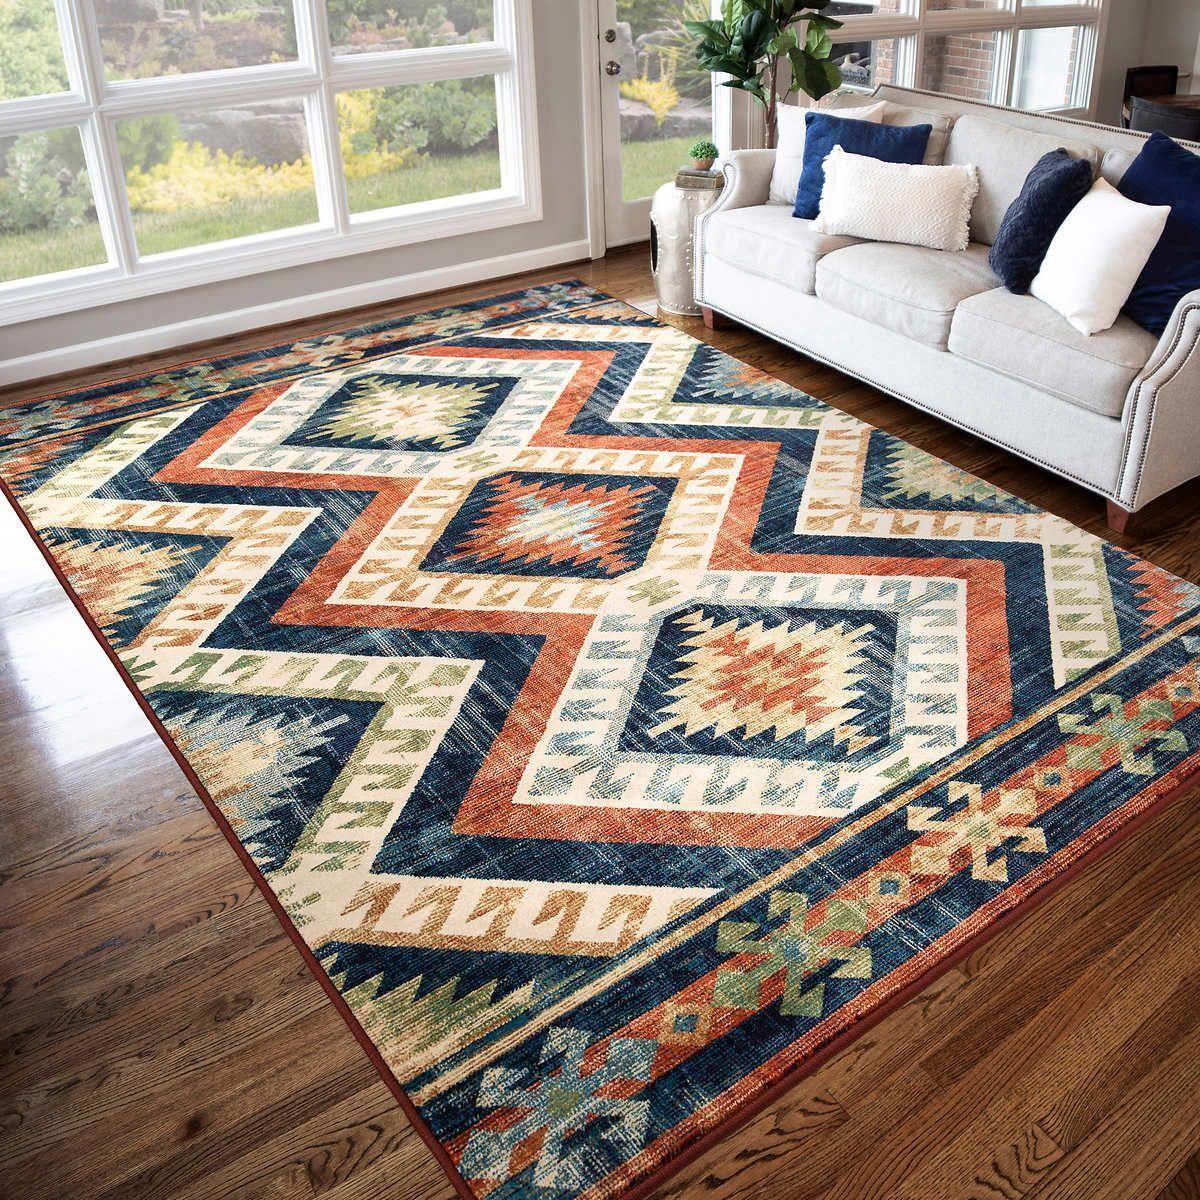 1 bohemianlivingroom Bohemian decor, Rugs, Bohemian rug